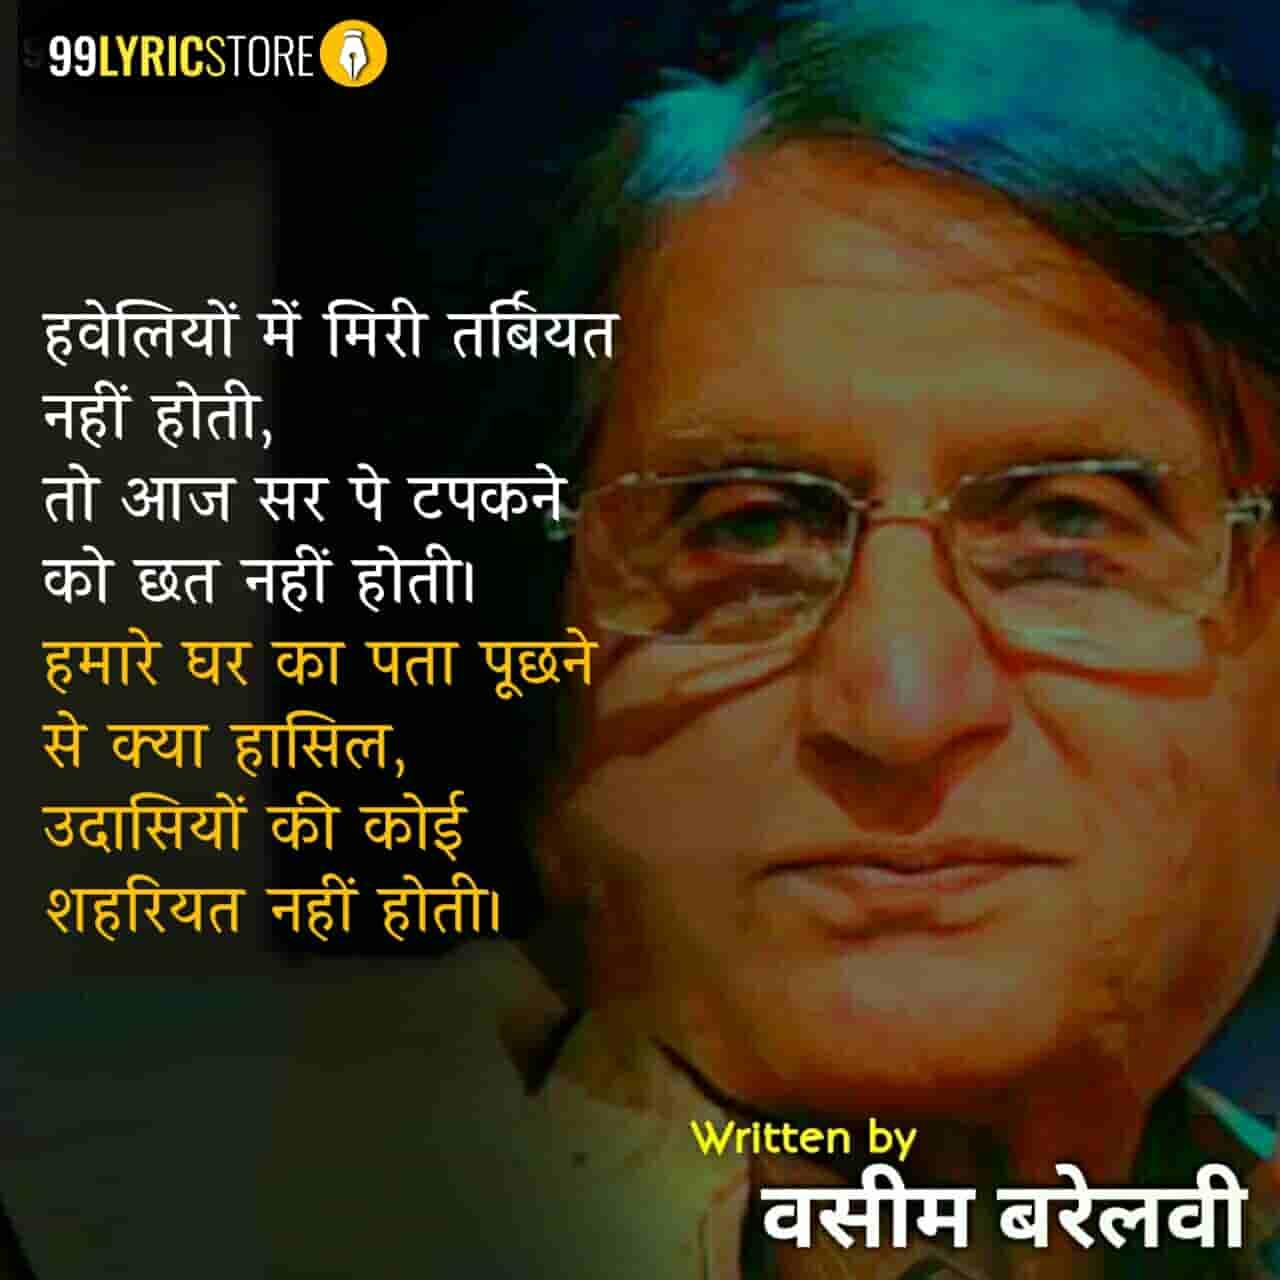 This beautiful ghazal 'Haweliyon Mein Miri Tarbiyat Nahin Hoti' has written by Waseem Barelvi.